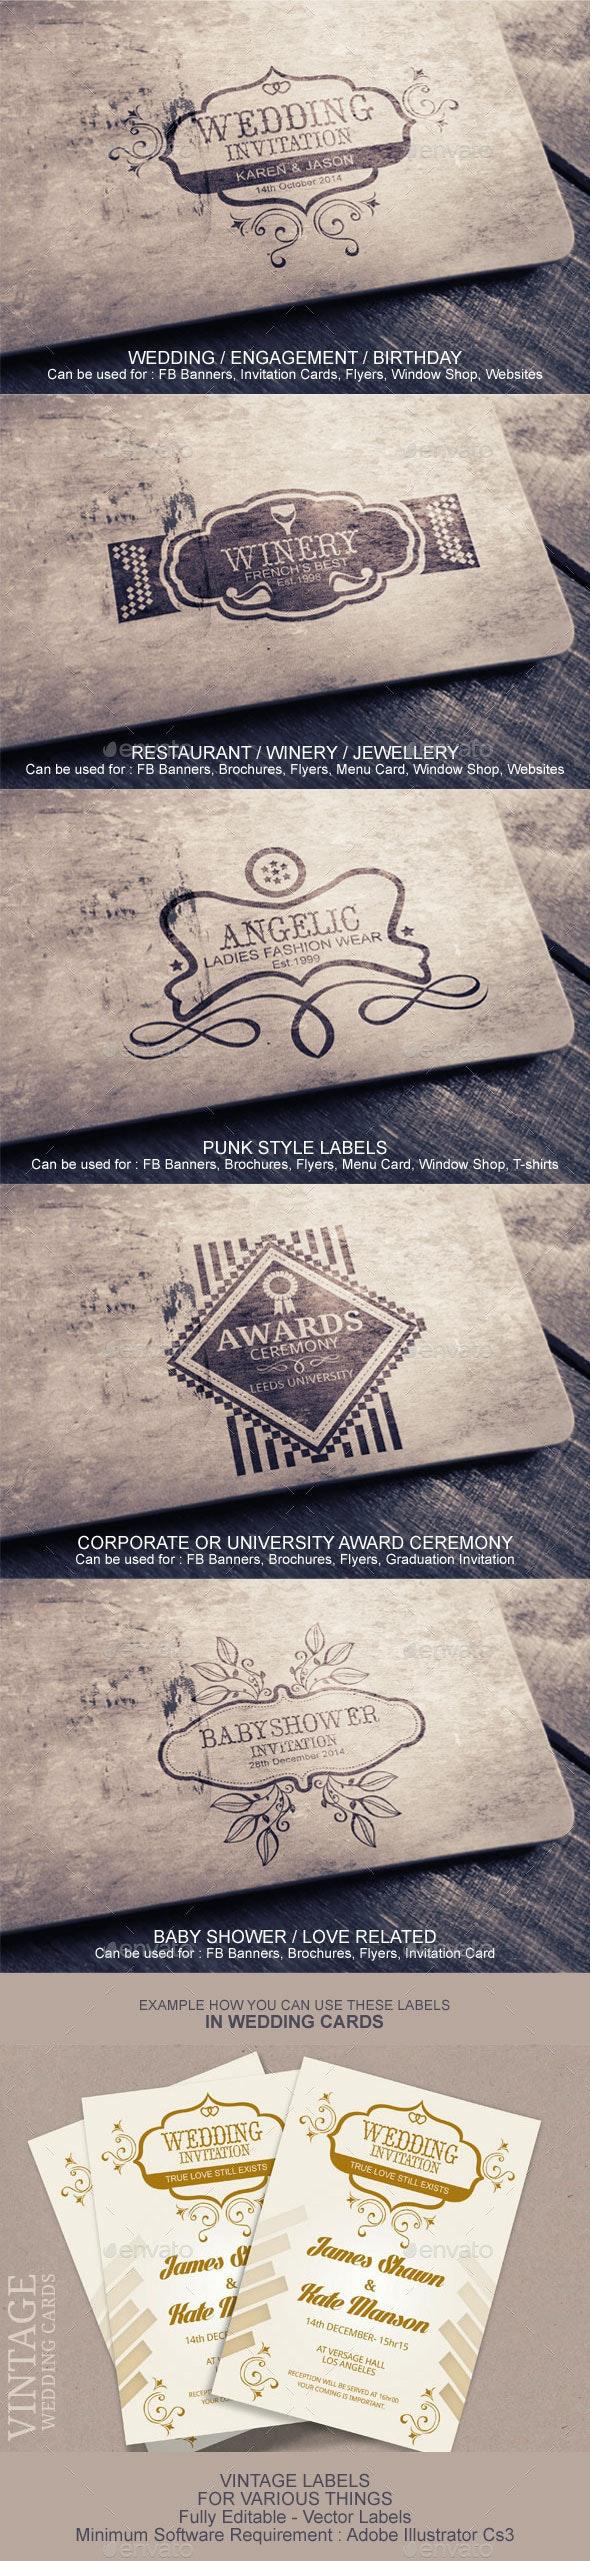 Vintage Labels And Badges - Badges & Stickers Web Elements